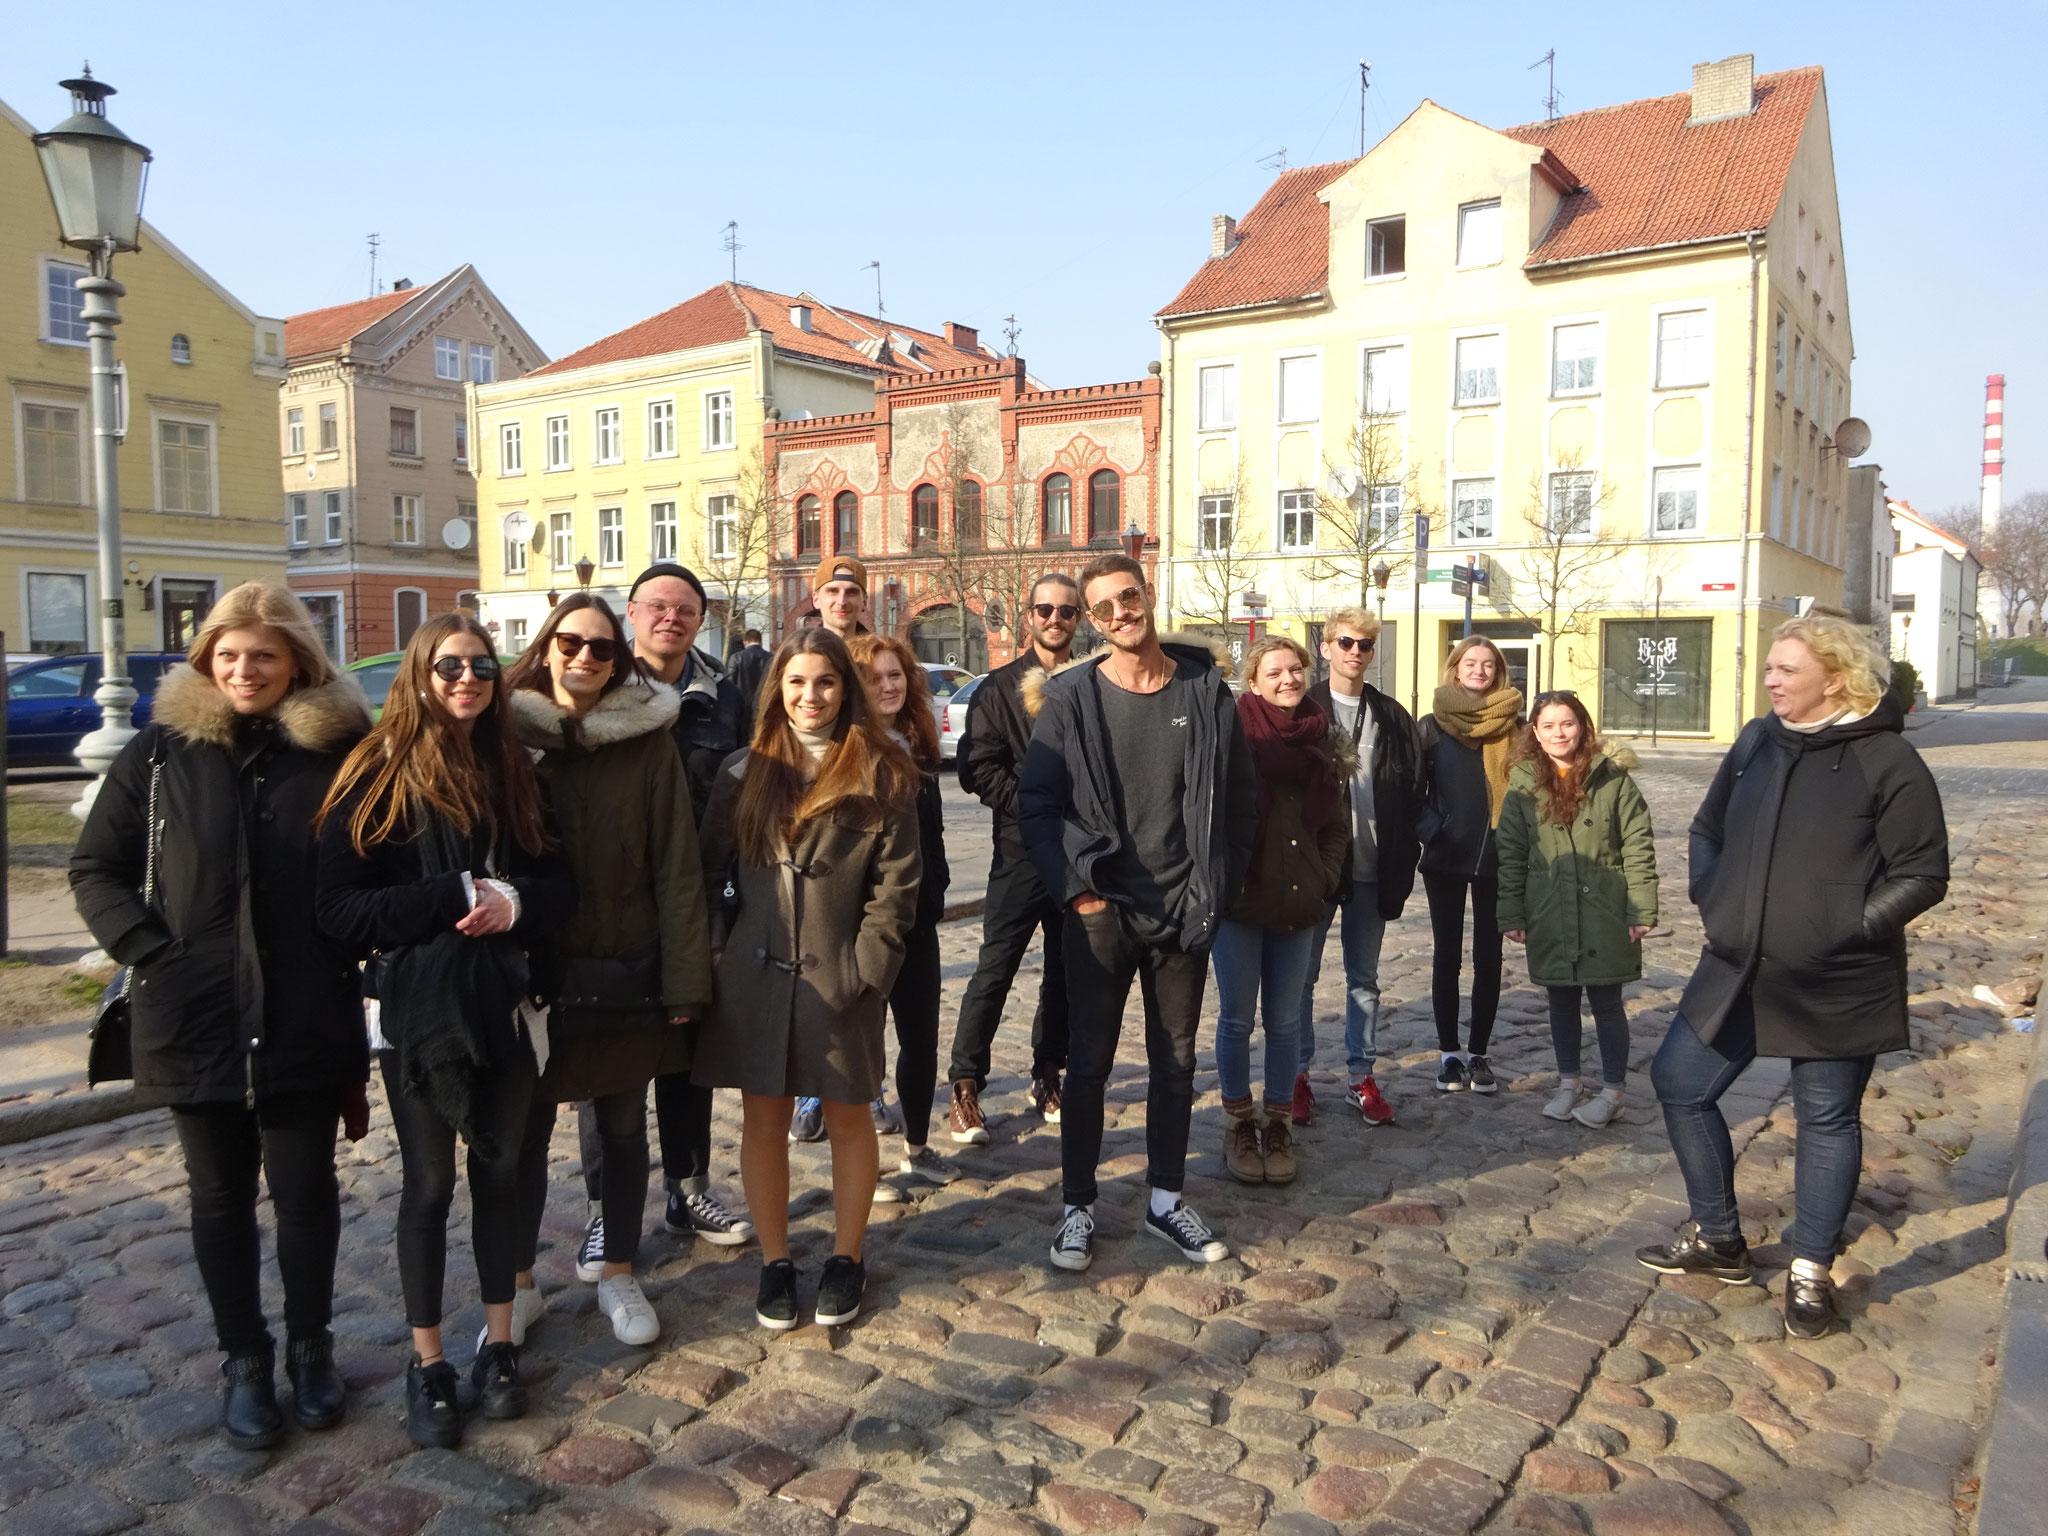 Citytour in Klaipeda